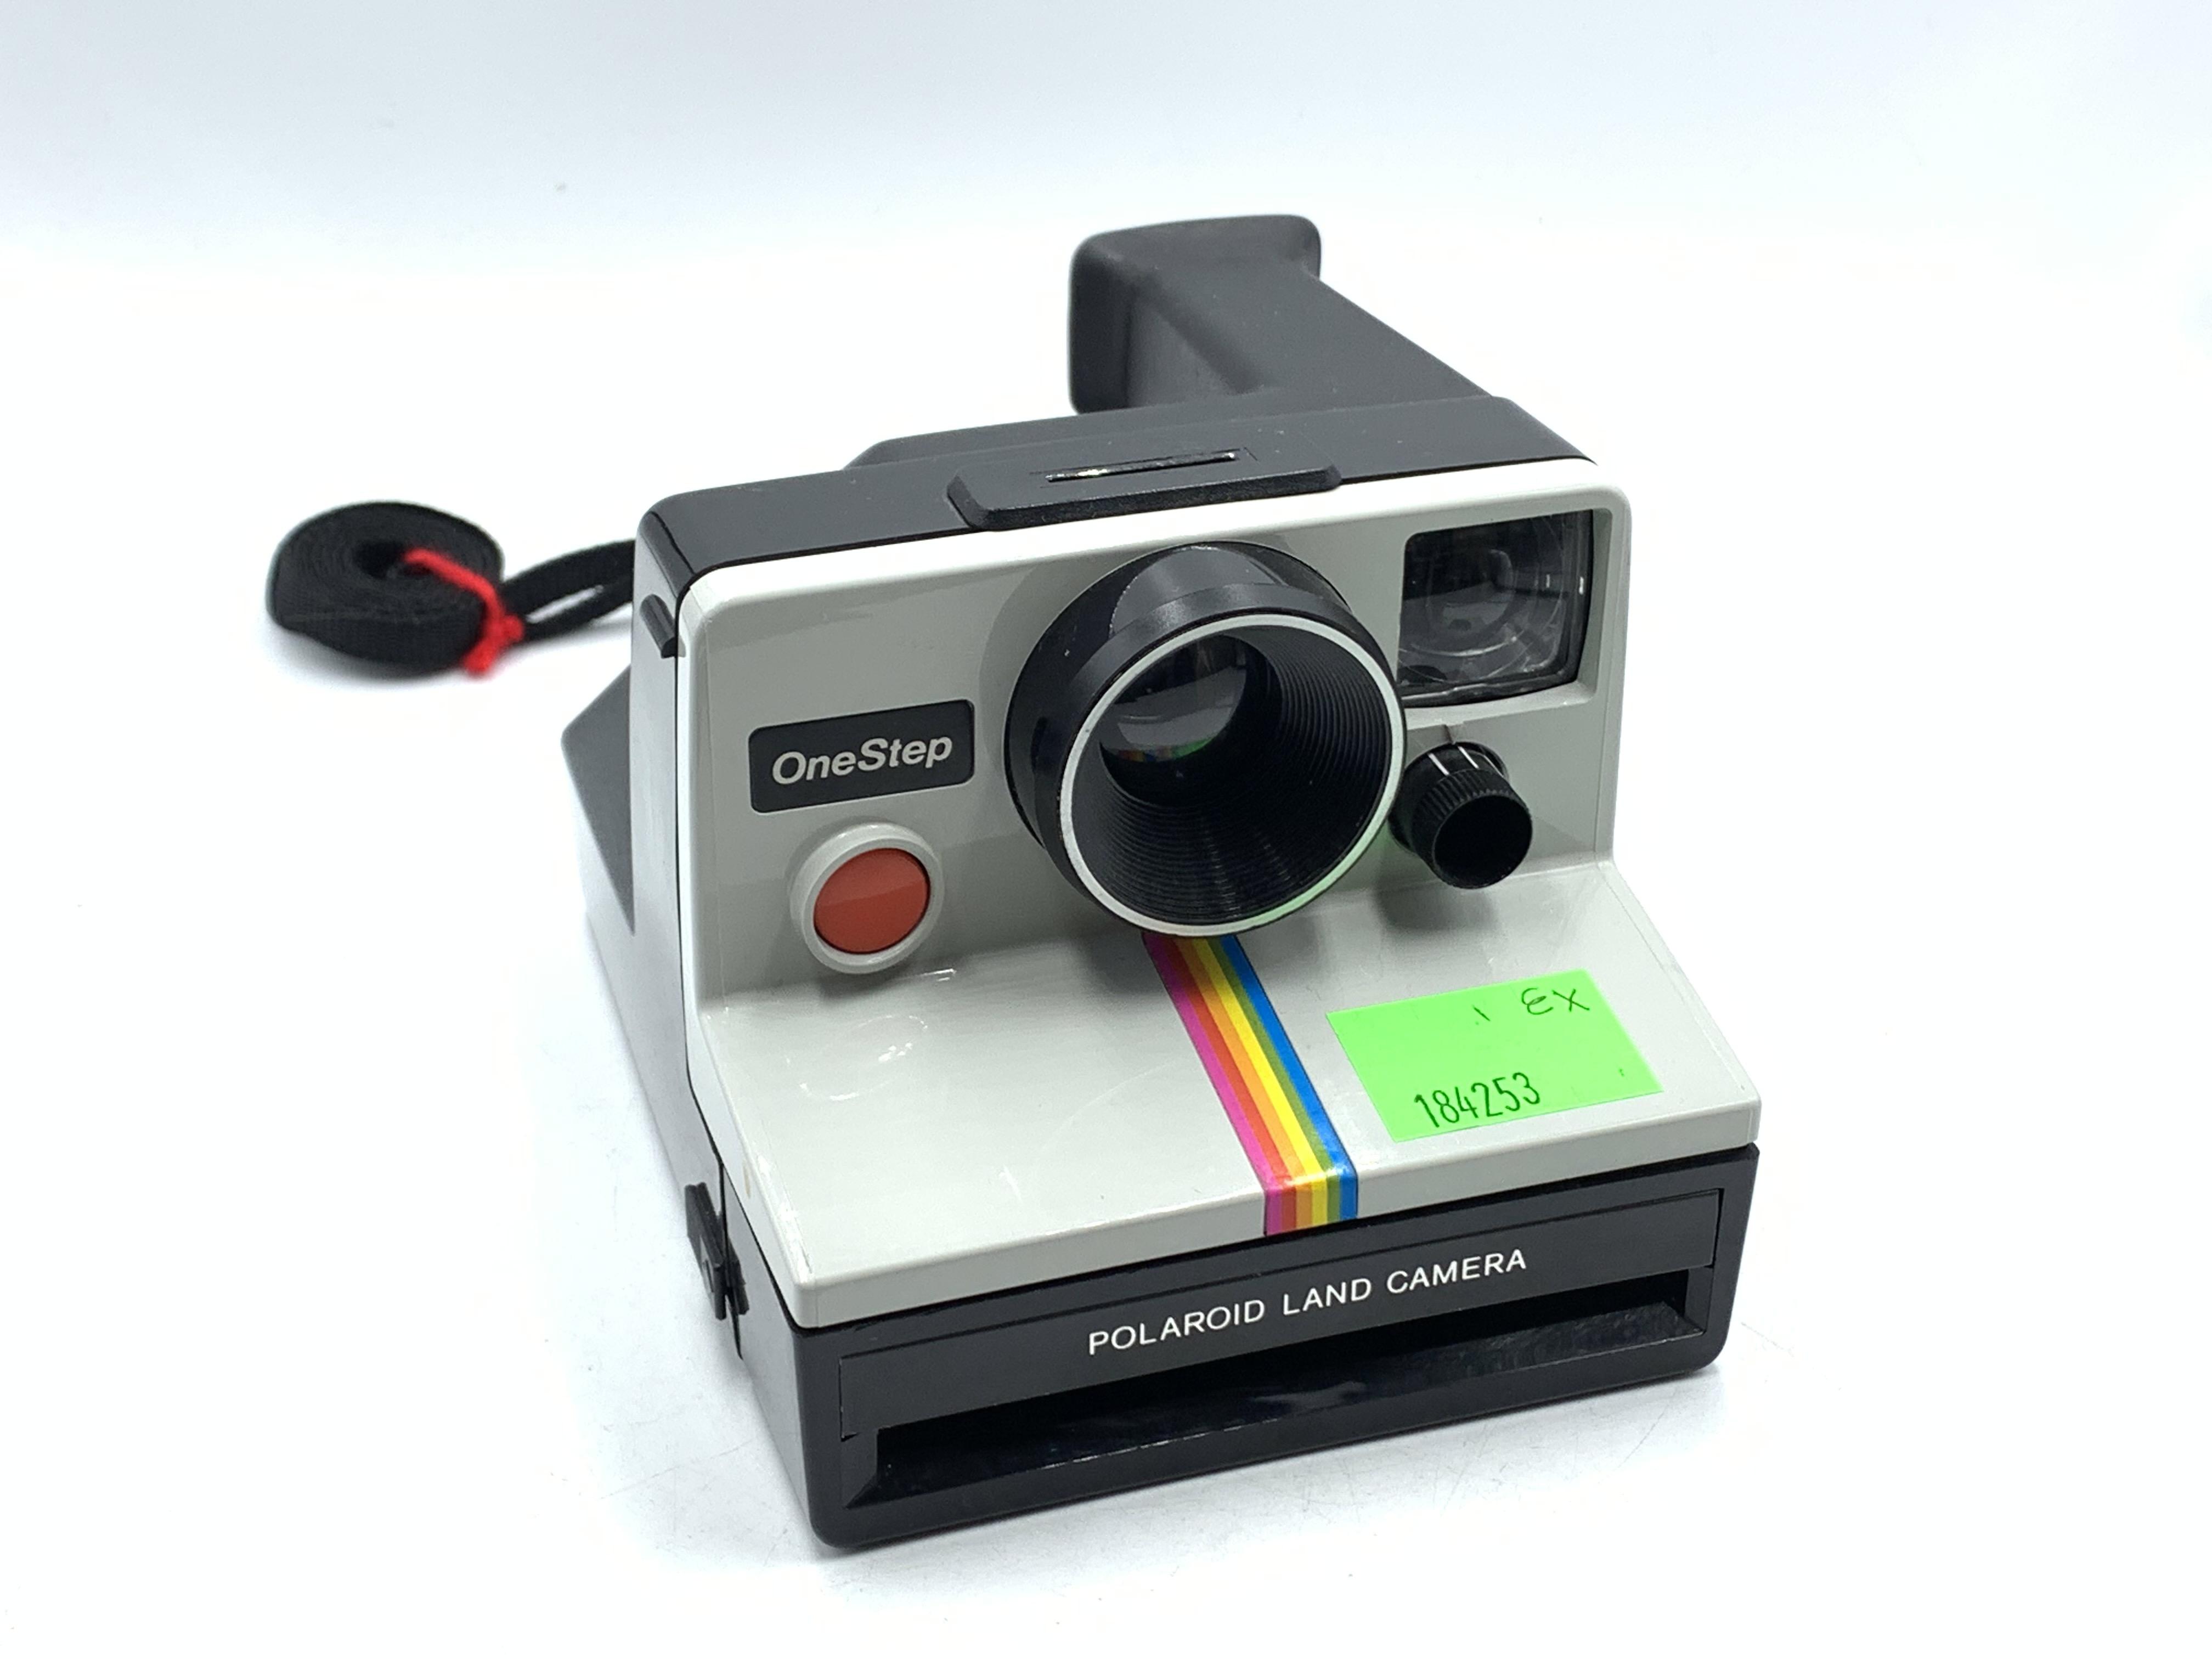 USED Polaroid One Step Land Camera